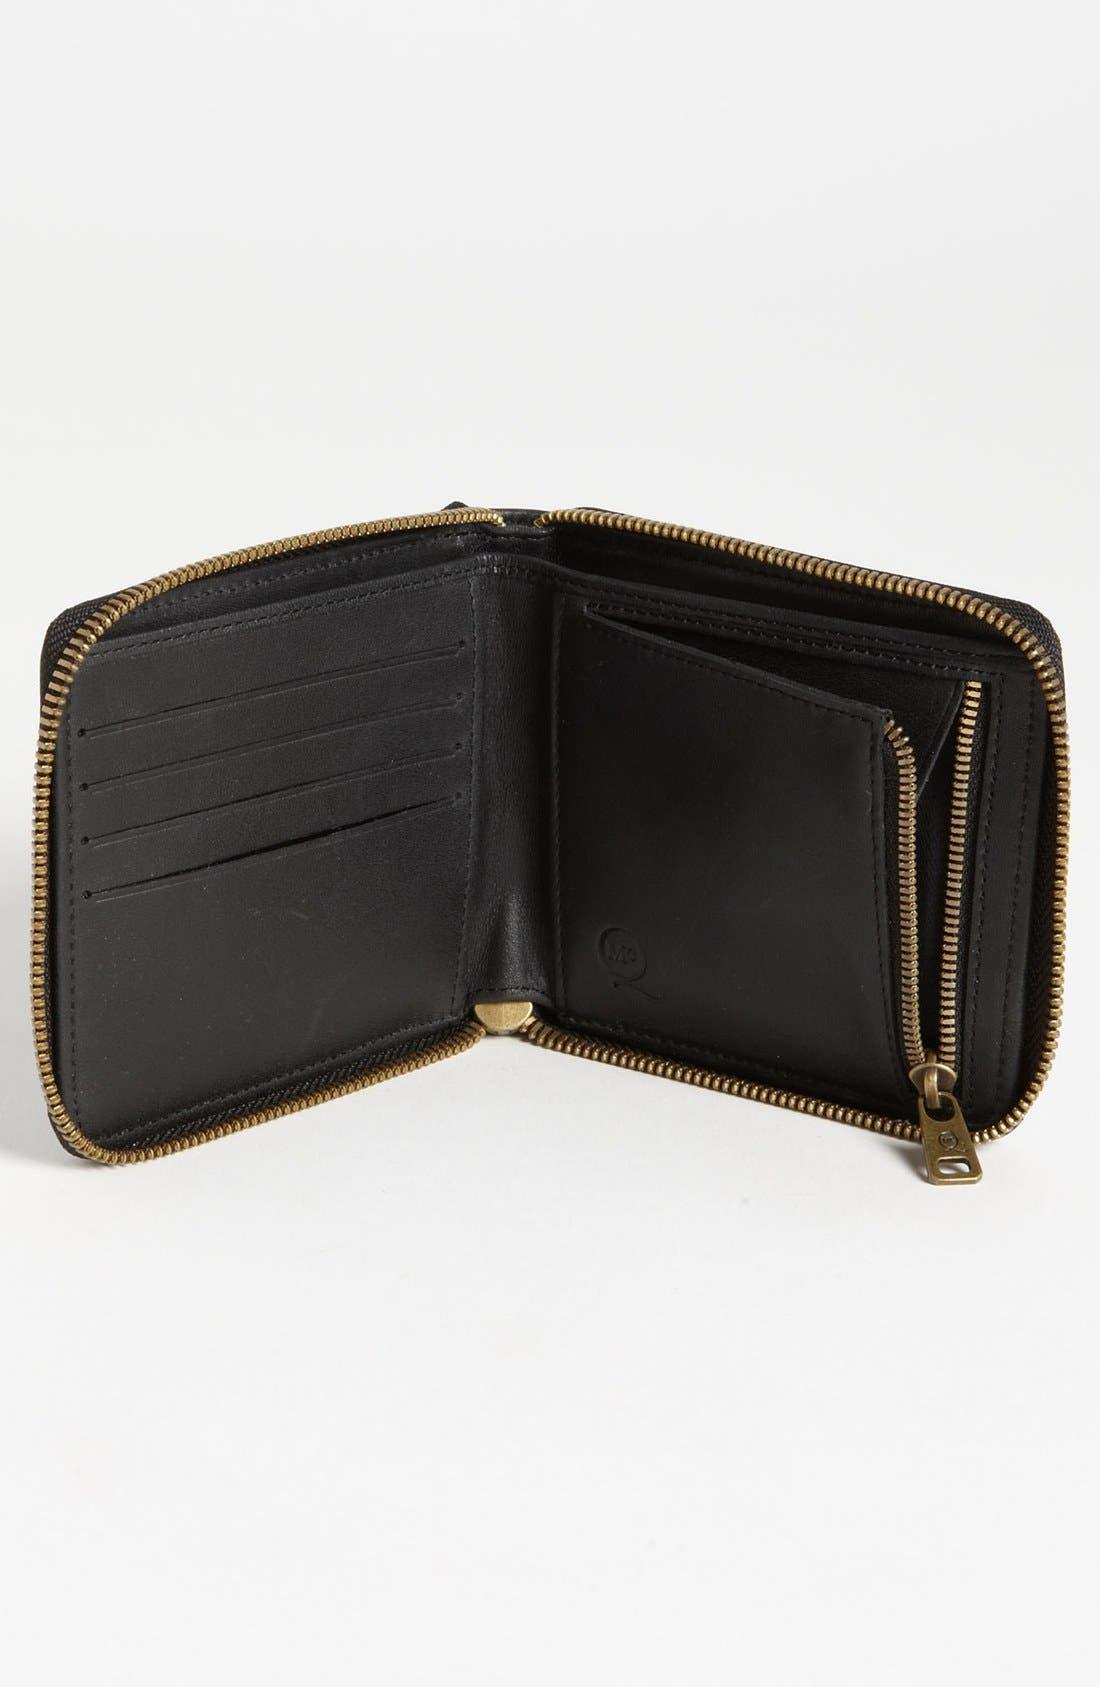 McQ by Alexander McQueen 'Aztec' Embossed Zip Around Wallet,                             Alternate thumbnail 2, color,                             Black